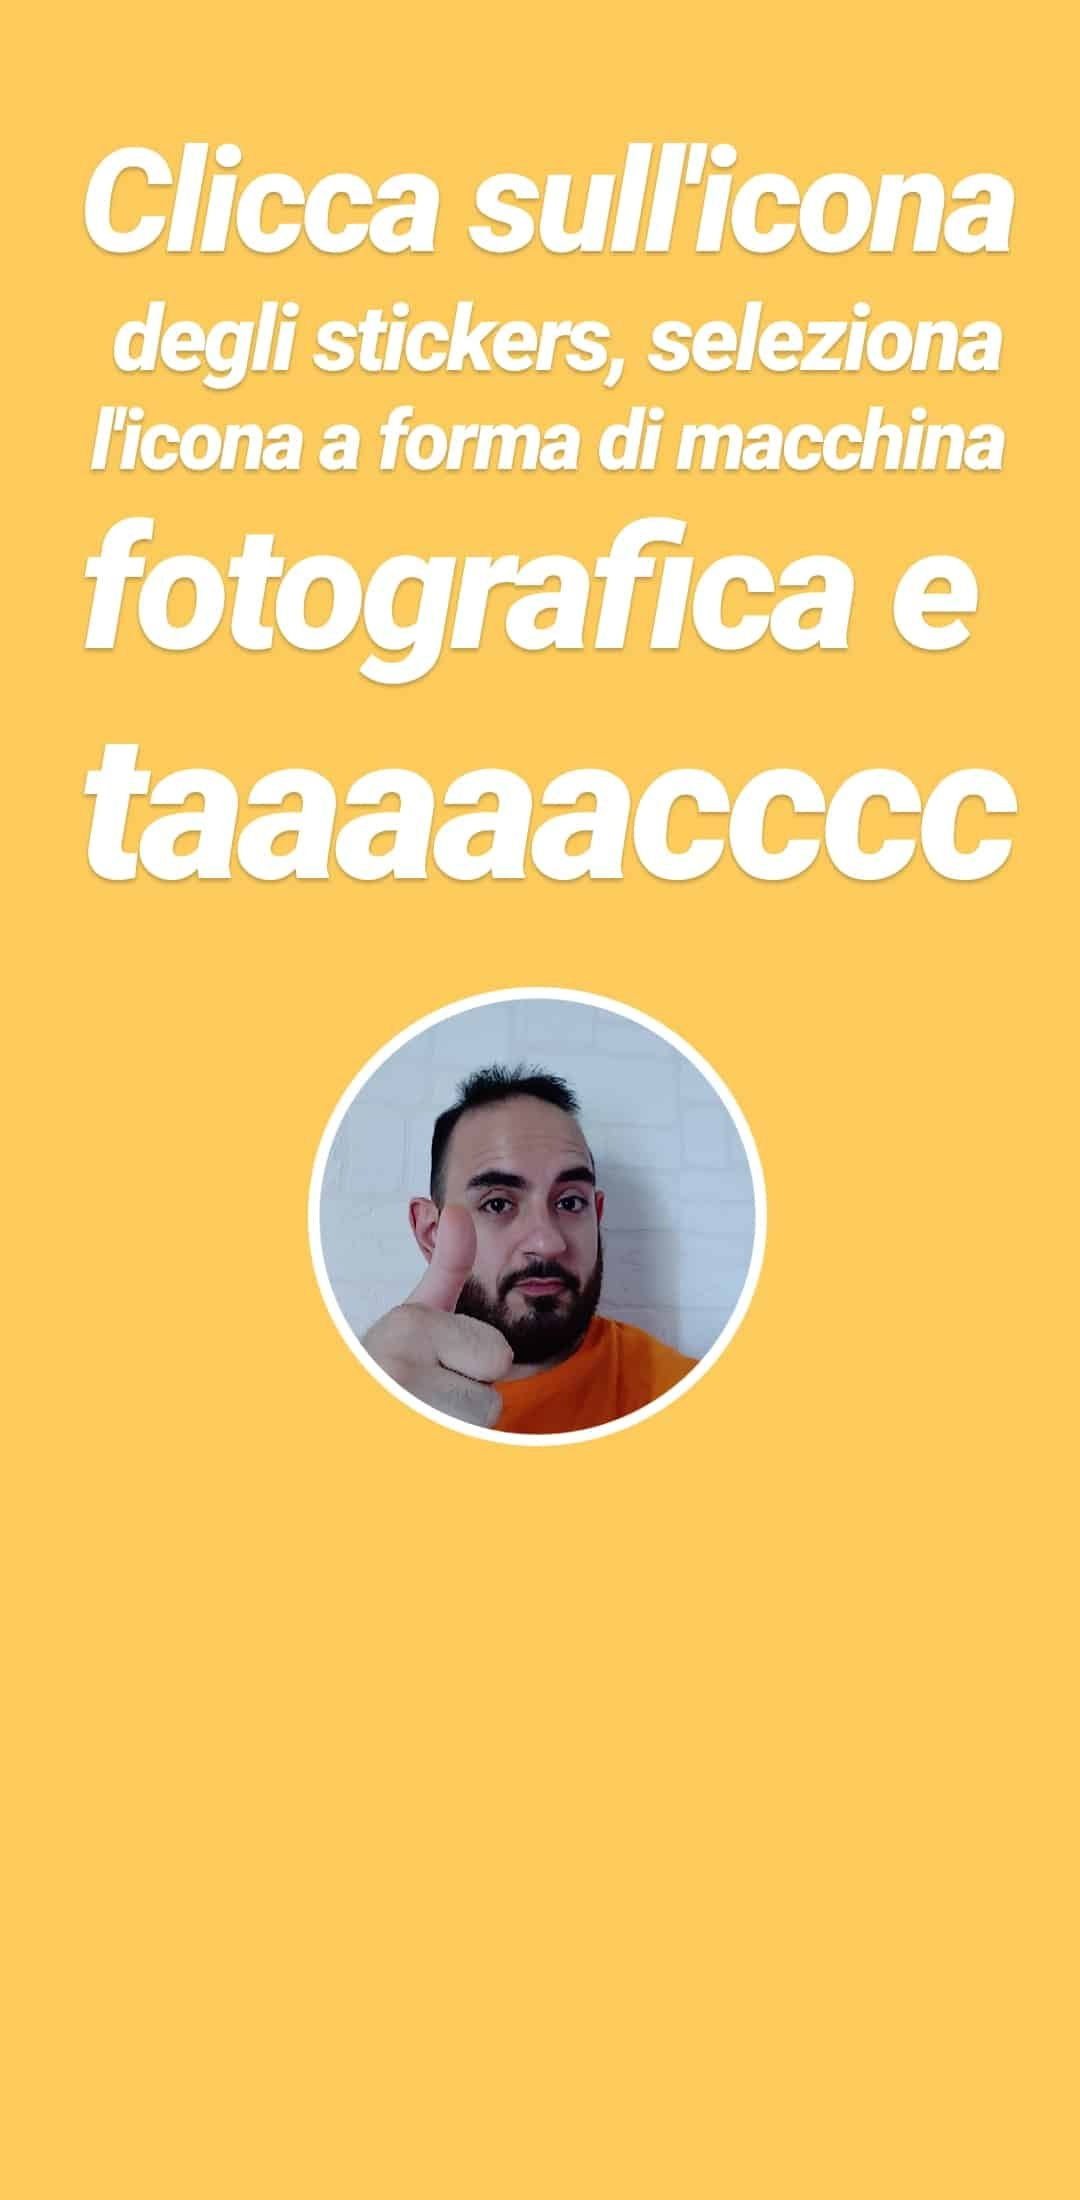 creare stickers instagram